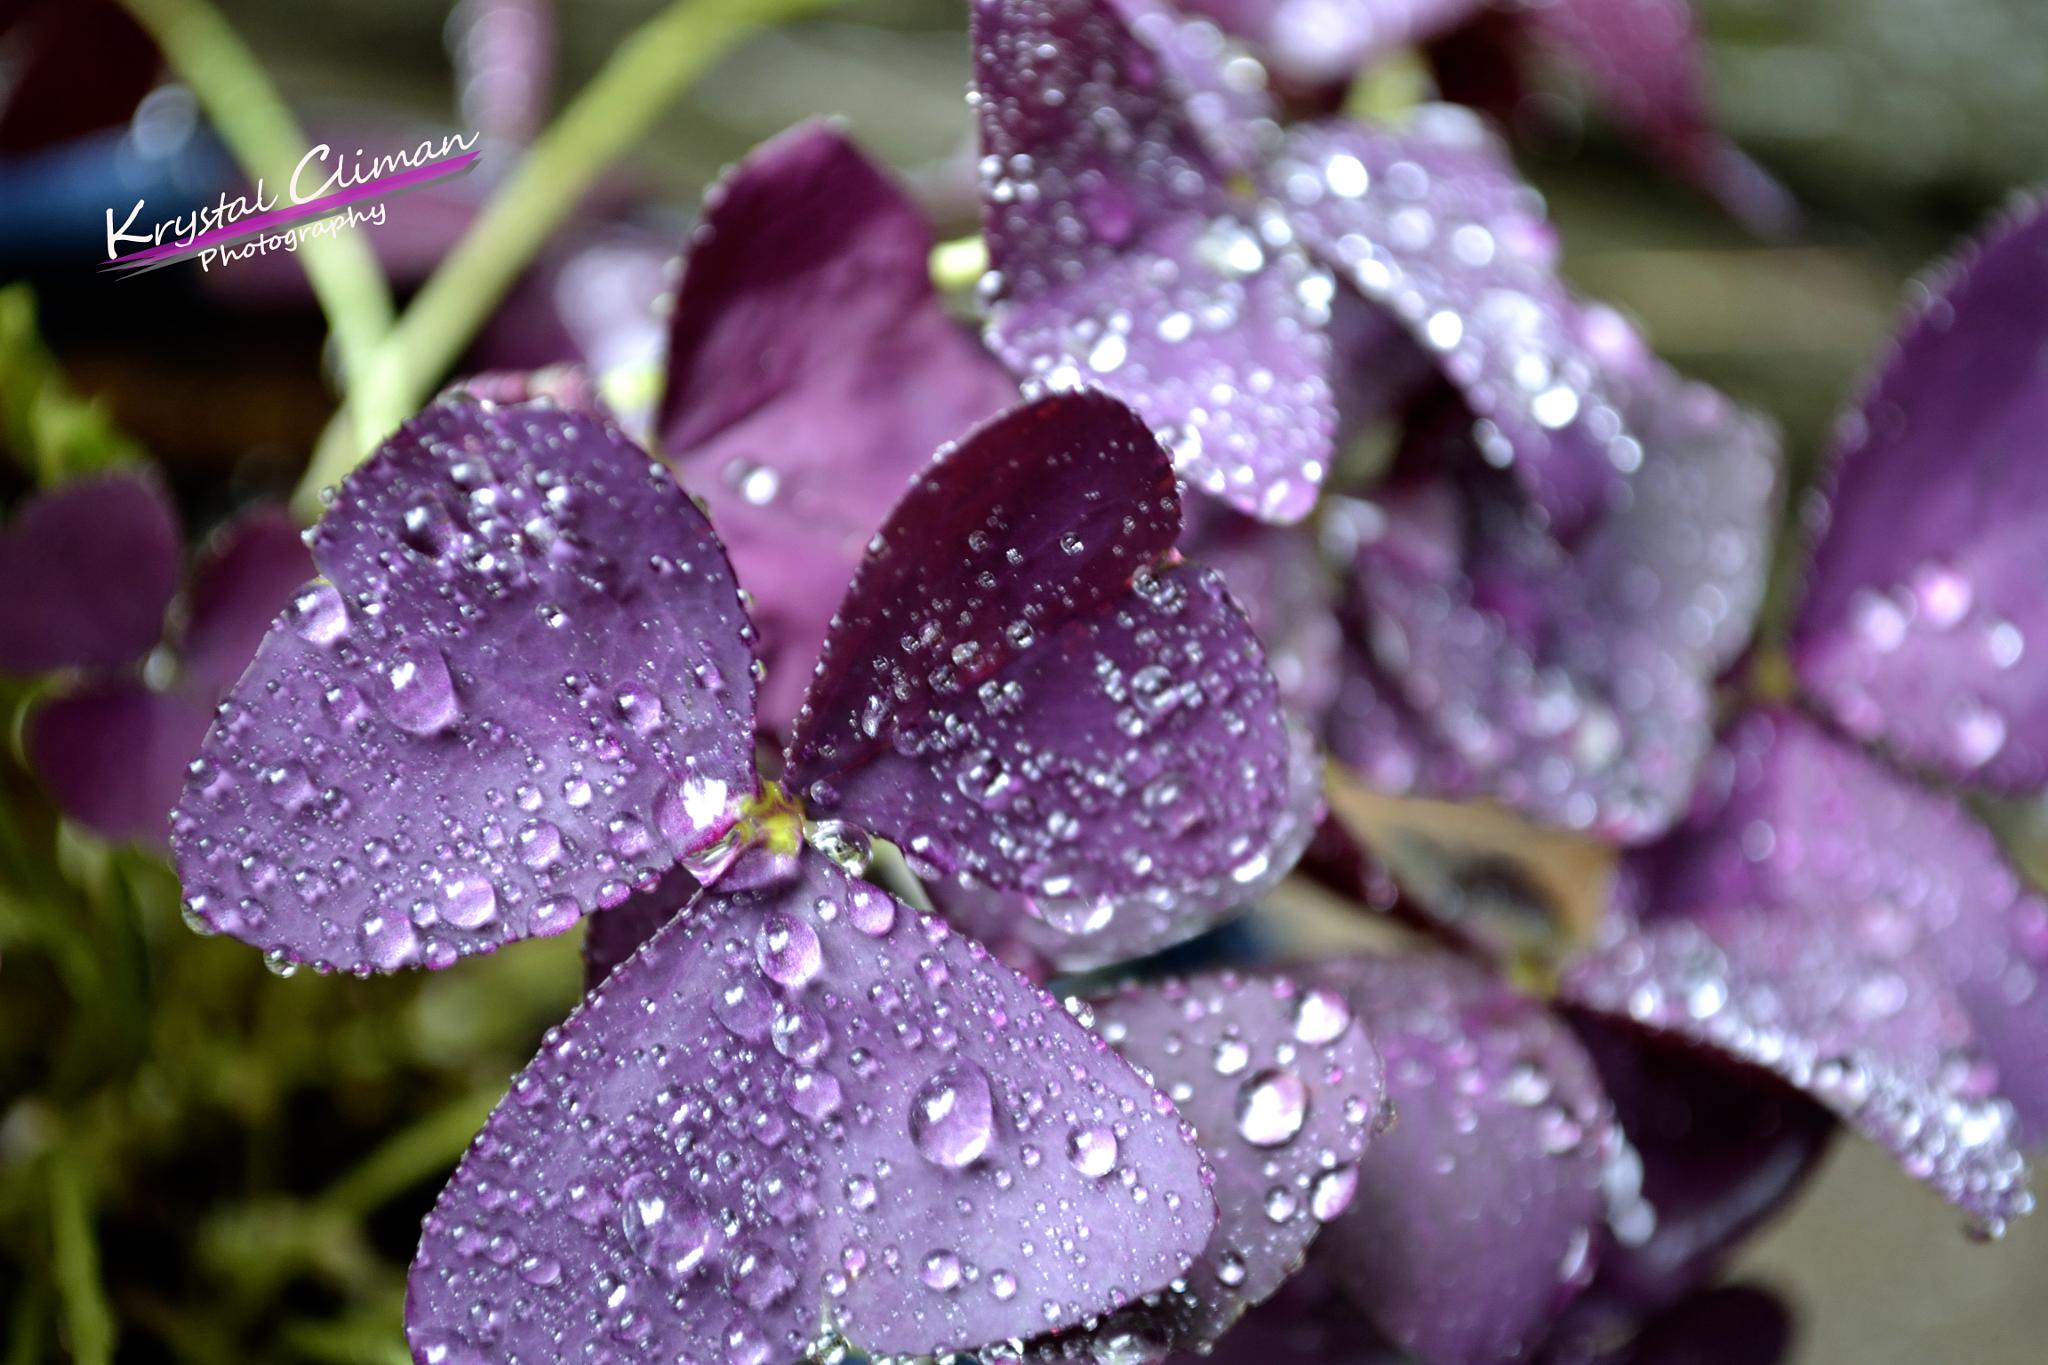 Droplets by Krystal Climan